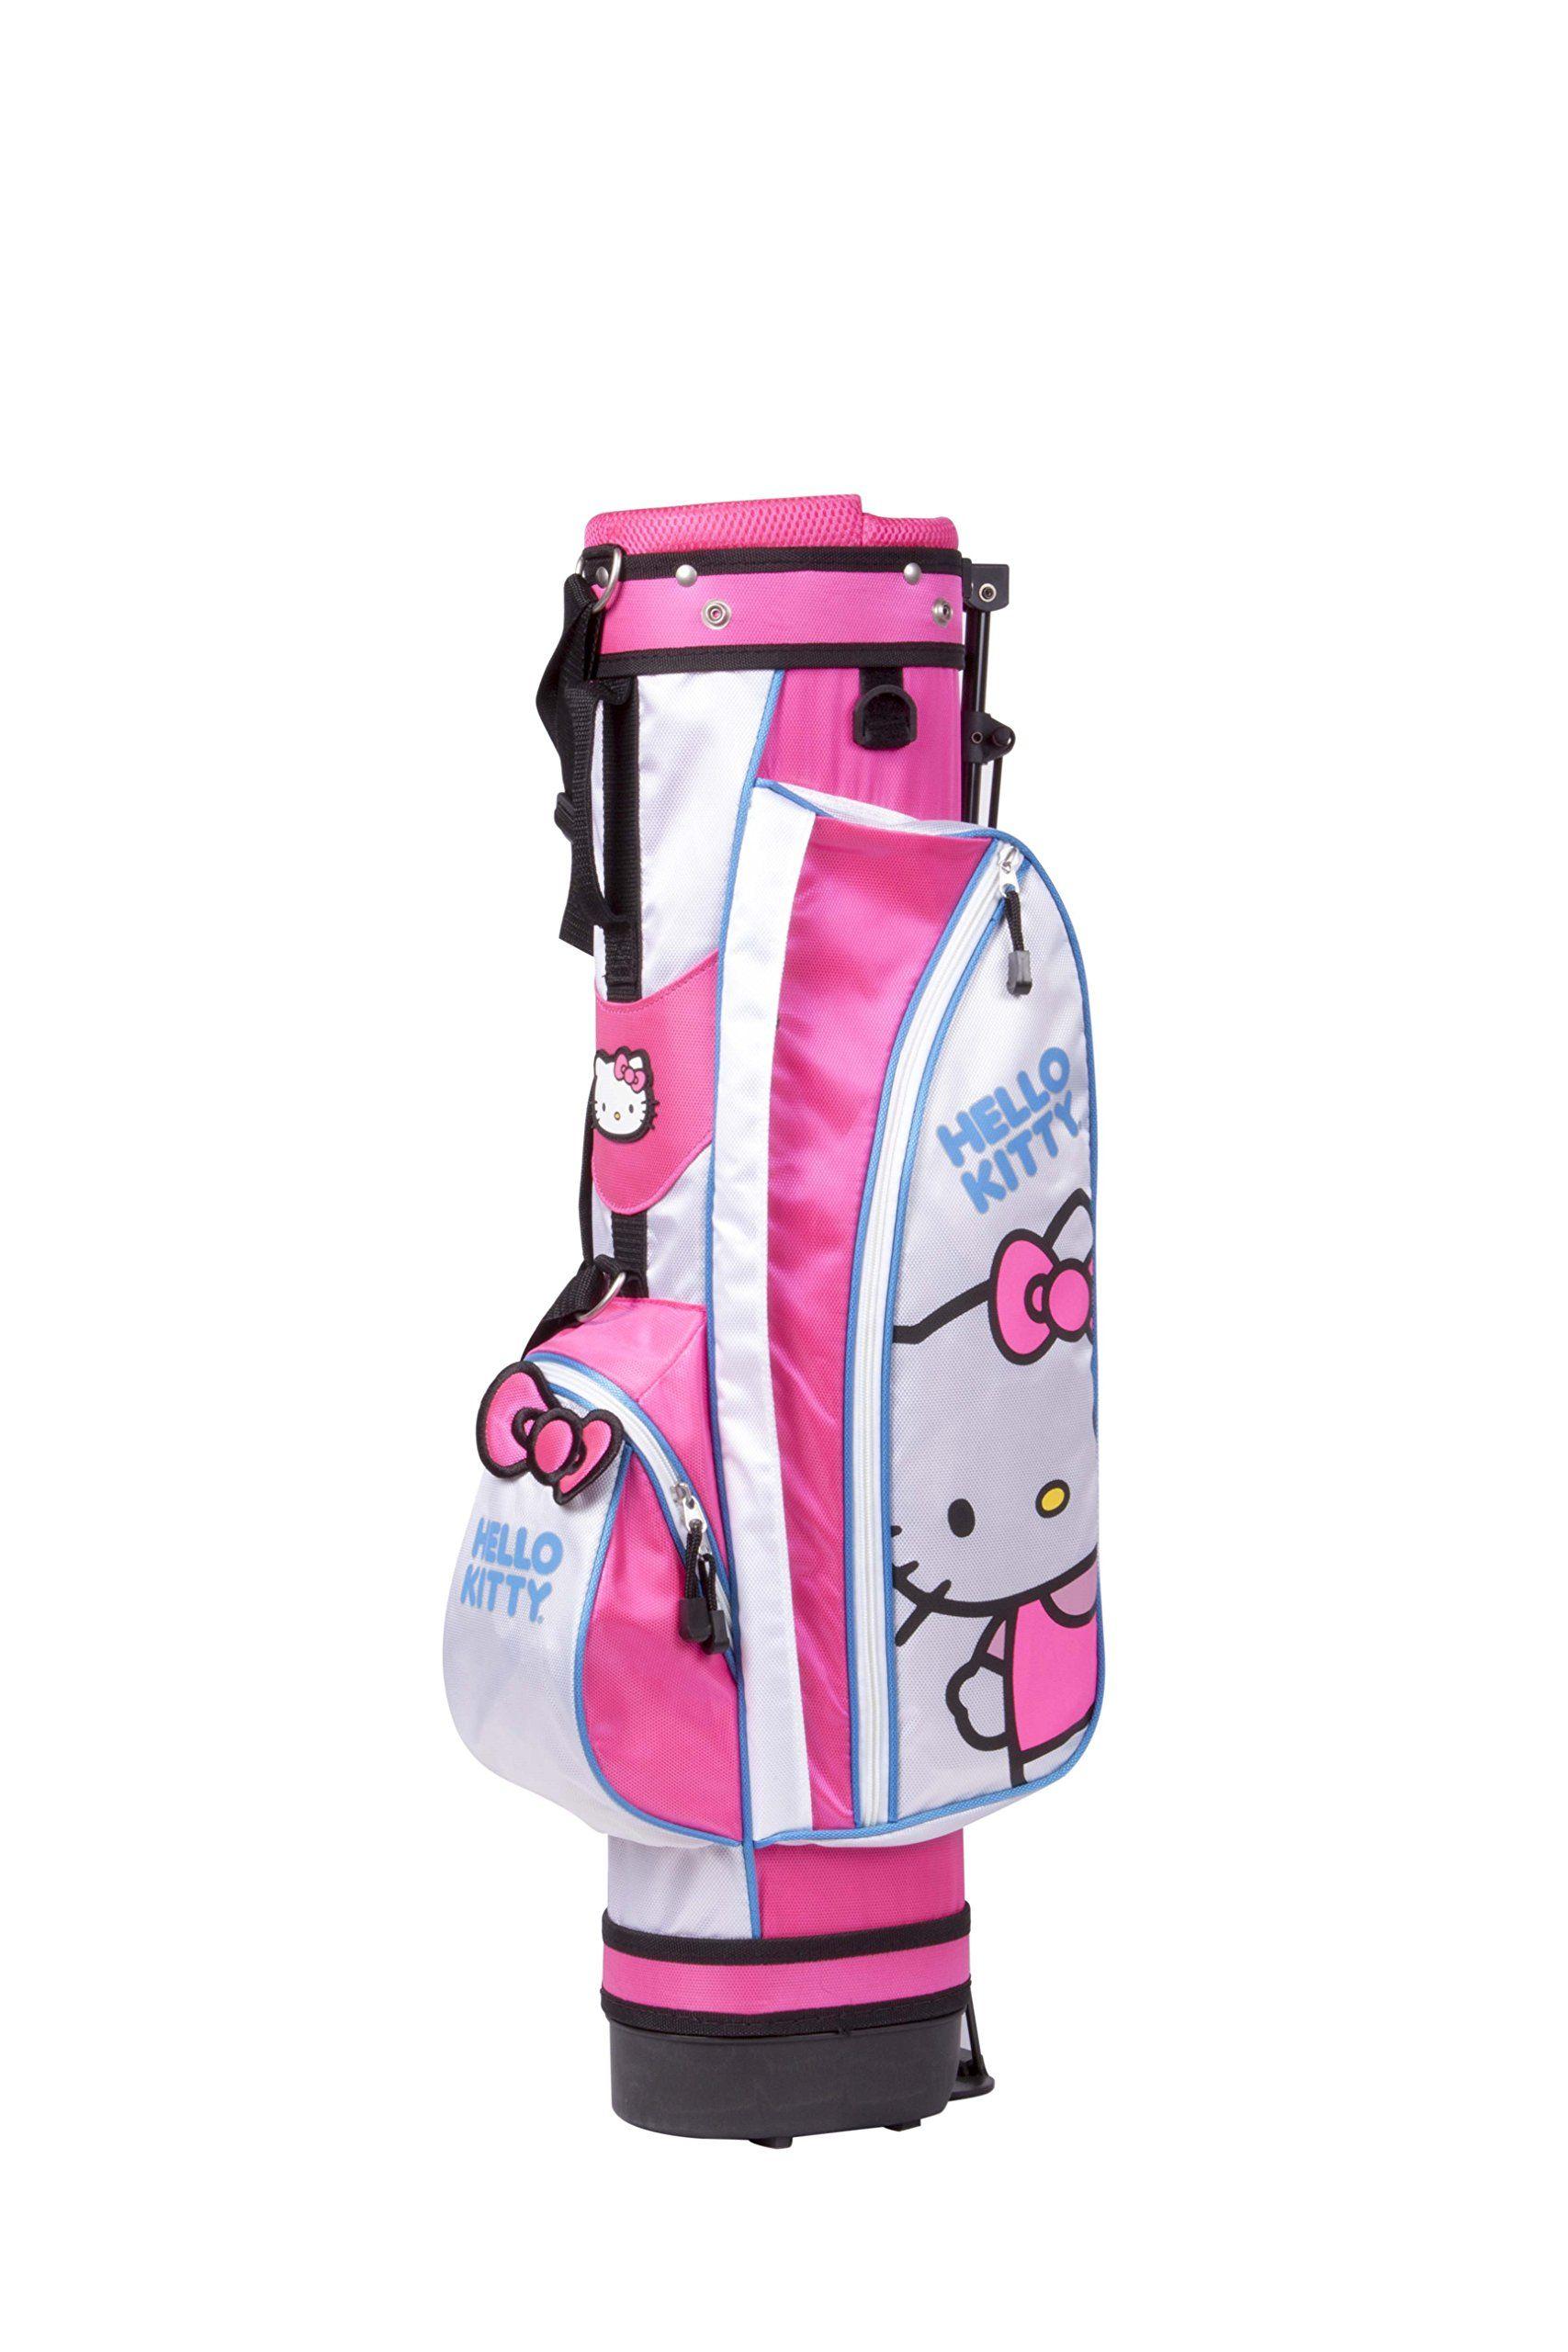 Golf Clubs Hello Kitty Sports Girls Junior Golf Set 35 Years Graphite Pink Golf Set Golf Tips Golf